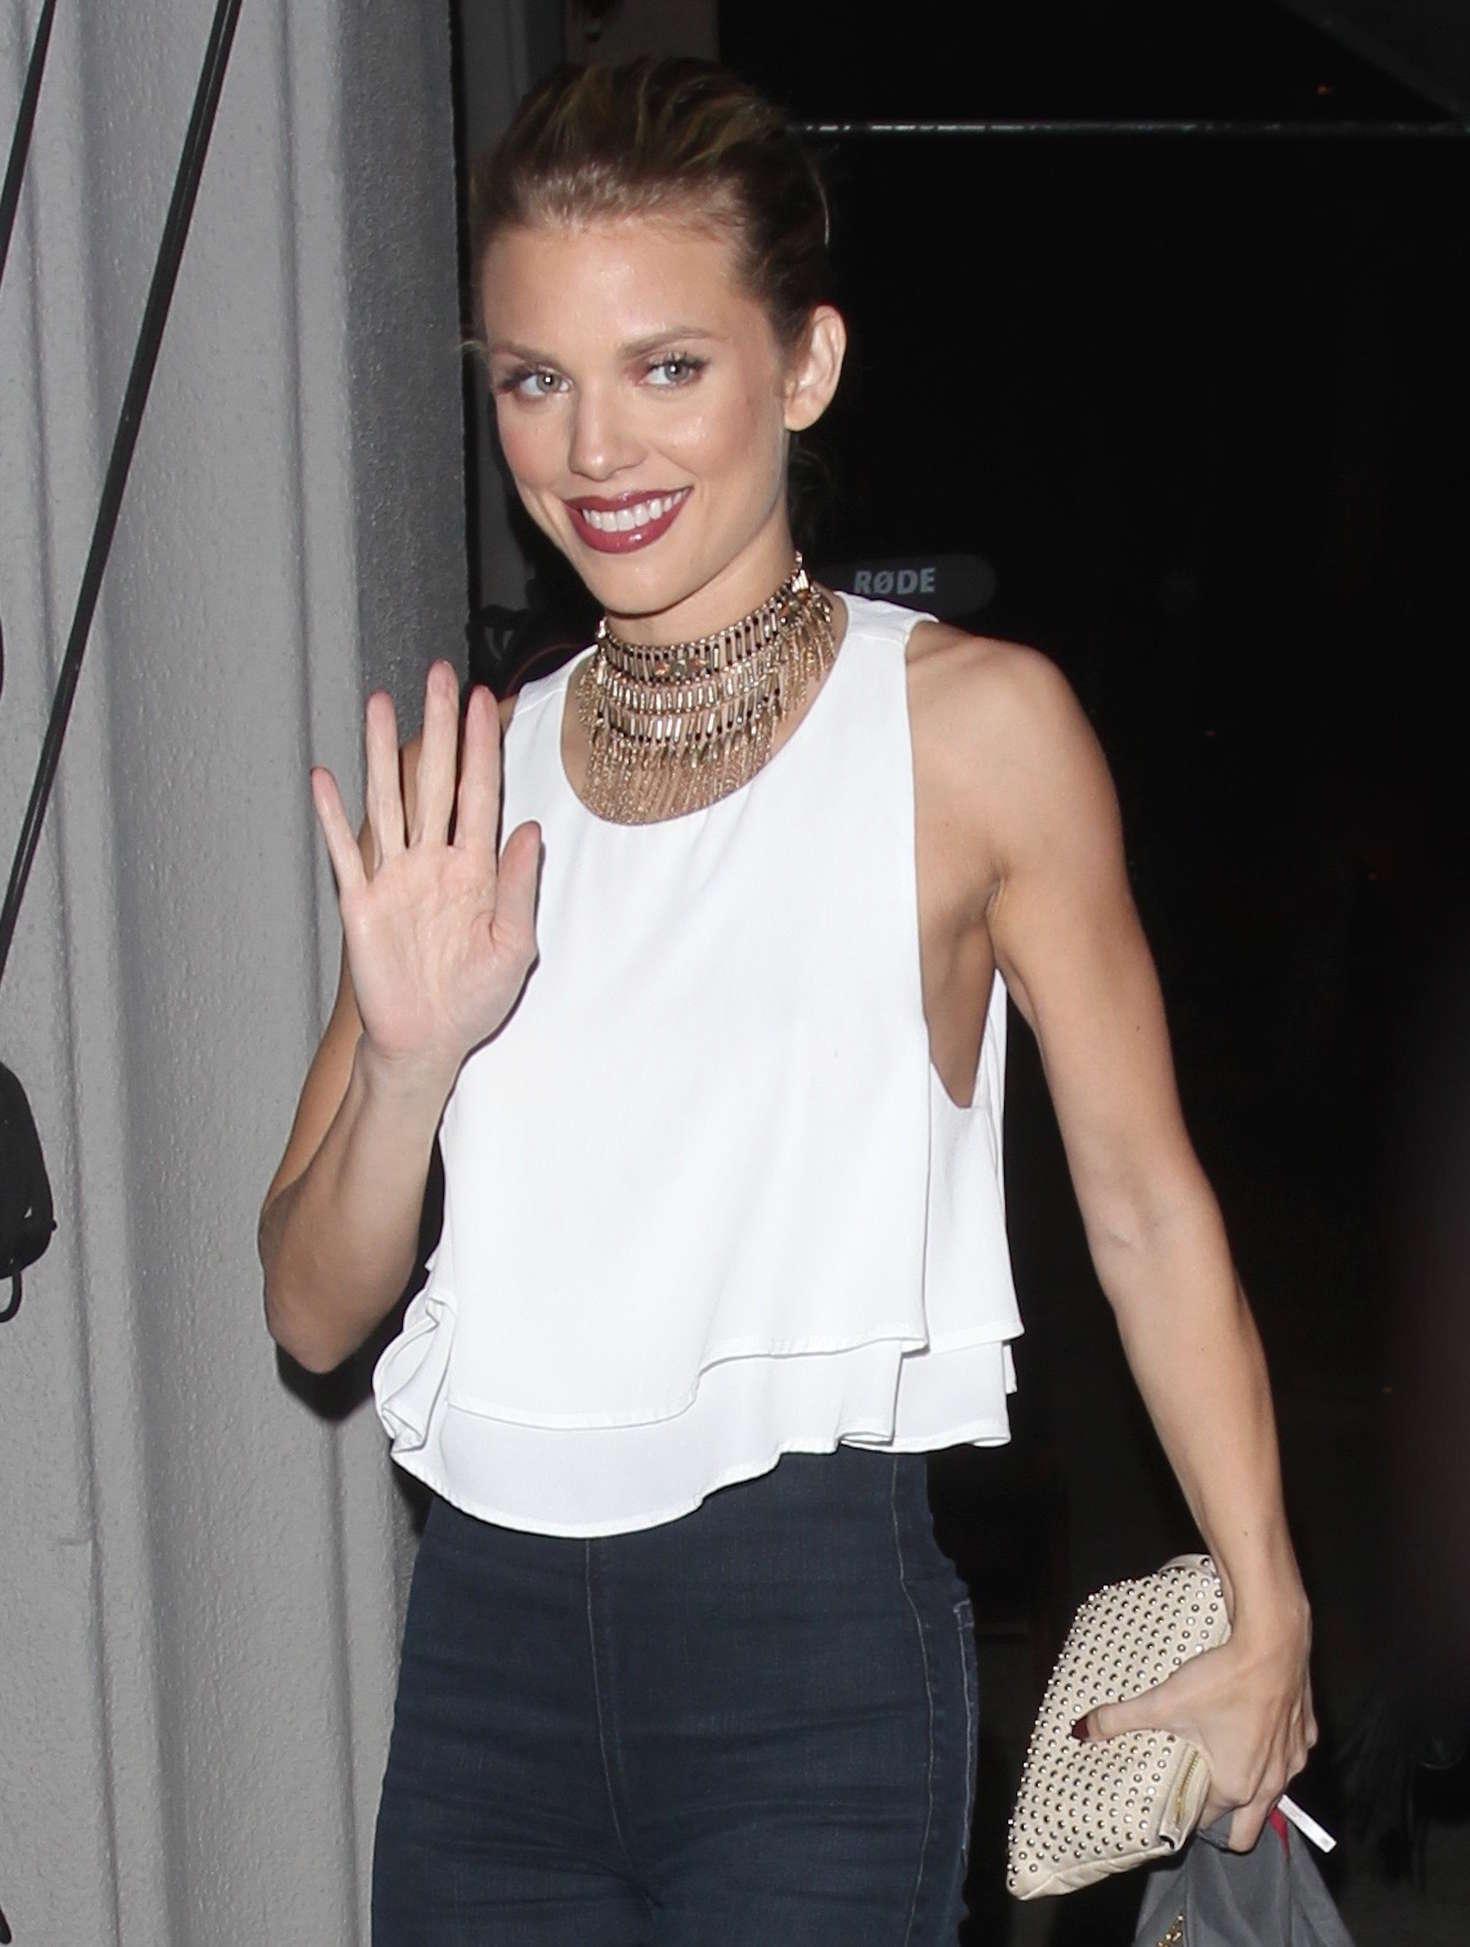 AnnaLynne McCord - Arrives at 'Craig's' restaurant in Los Angeles